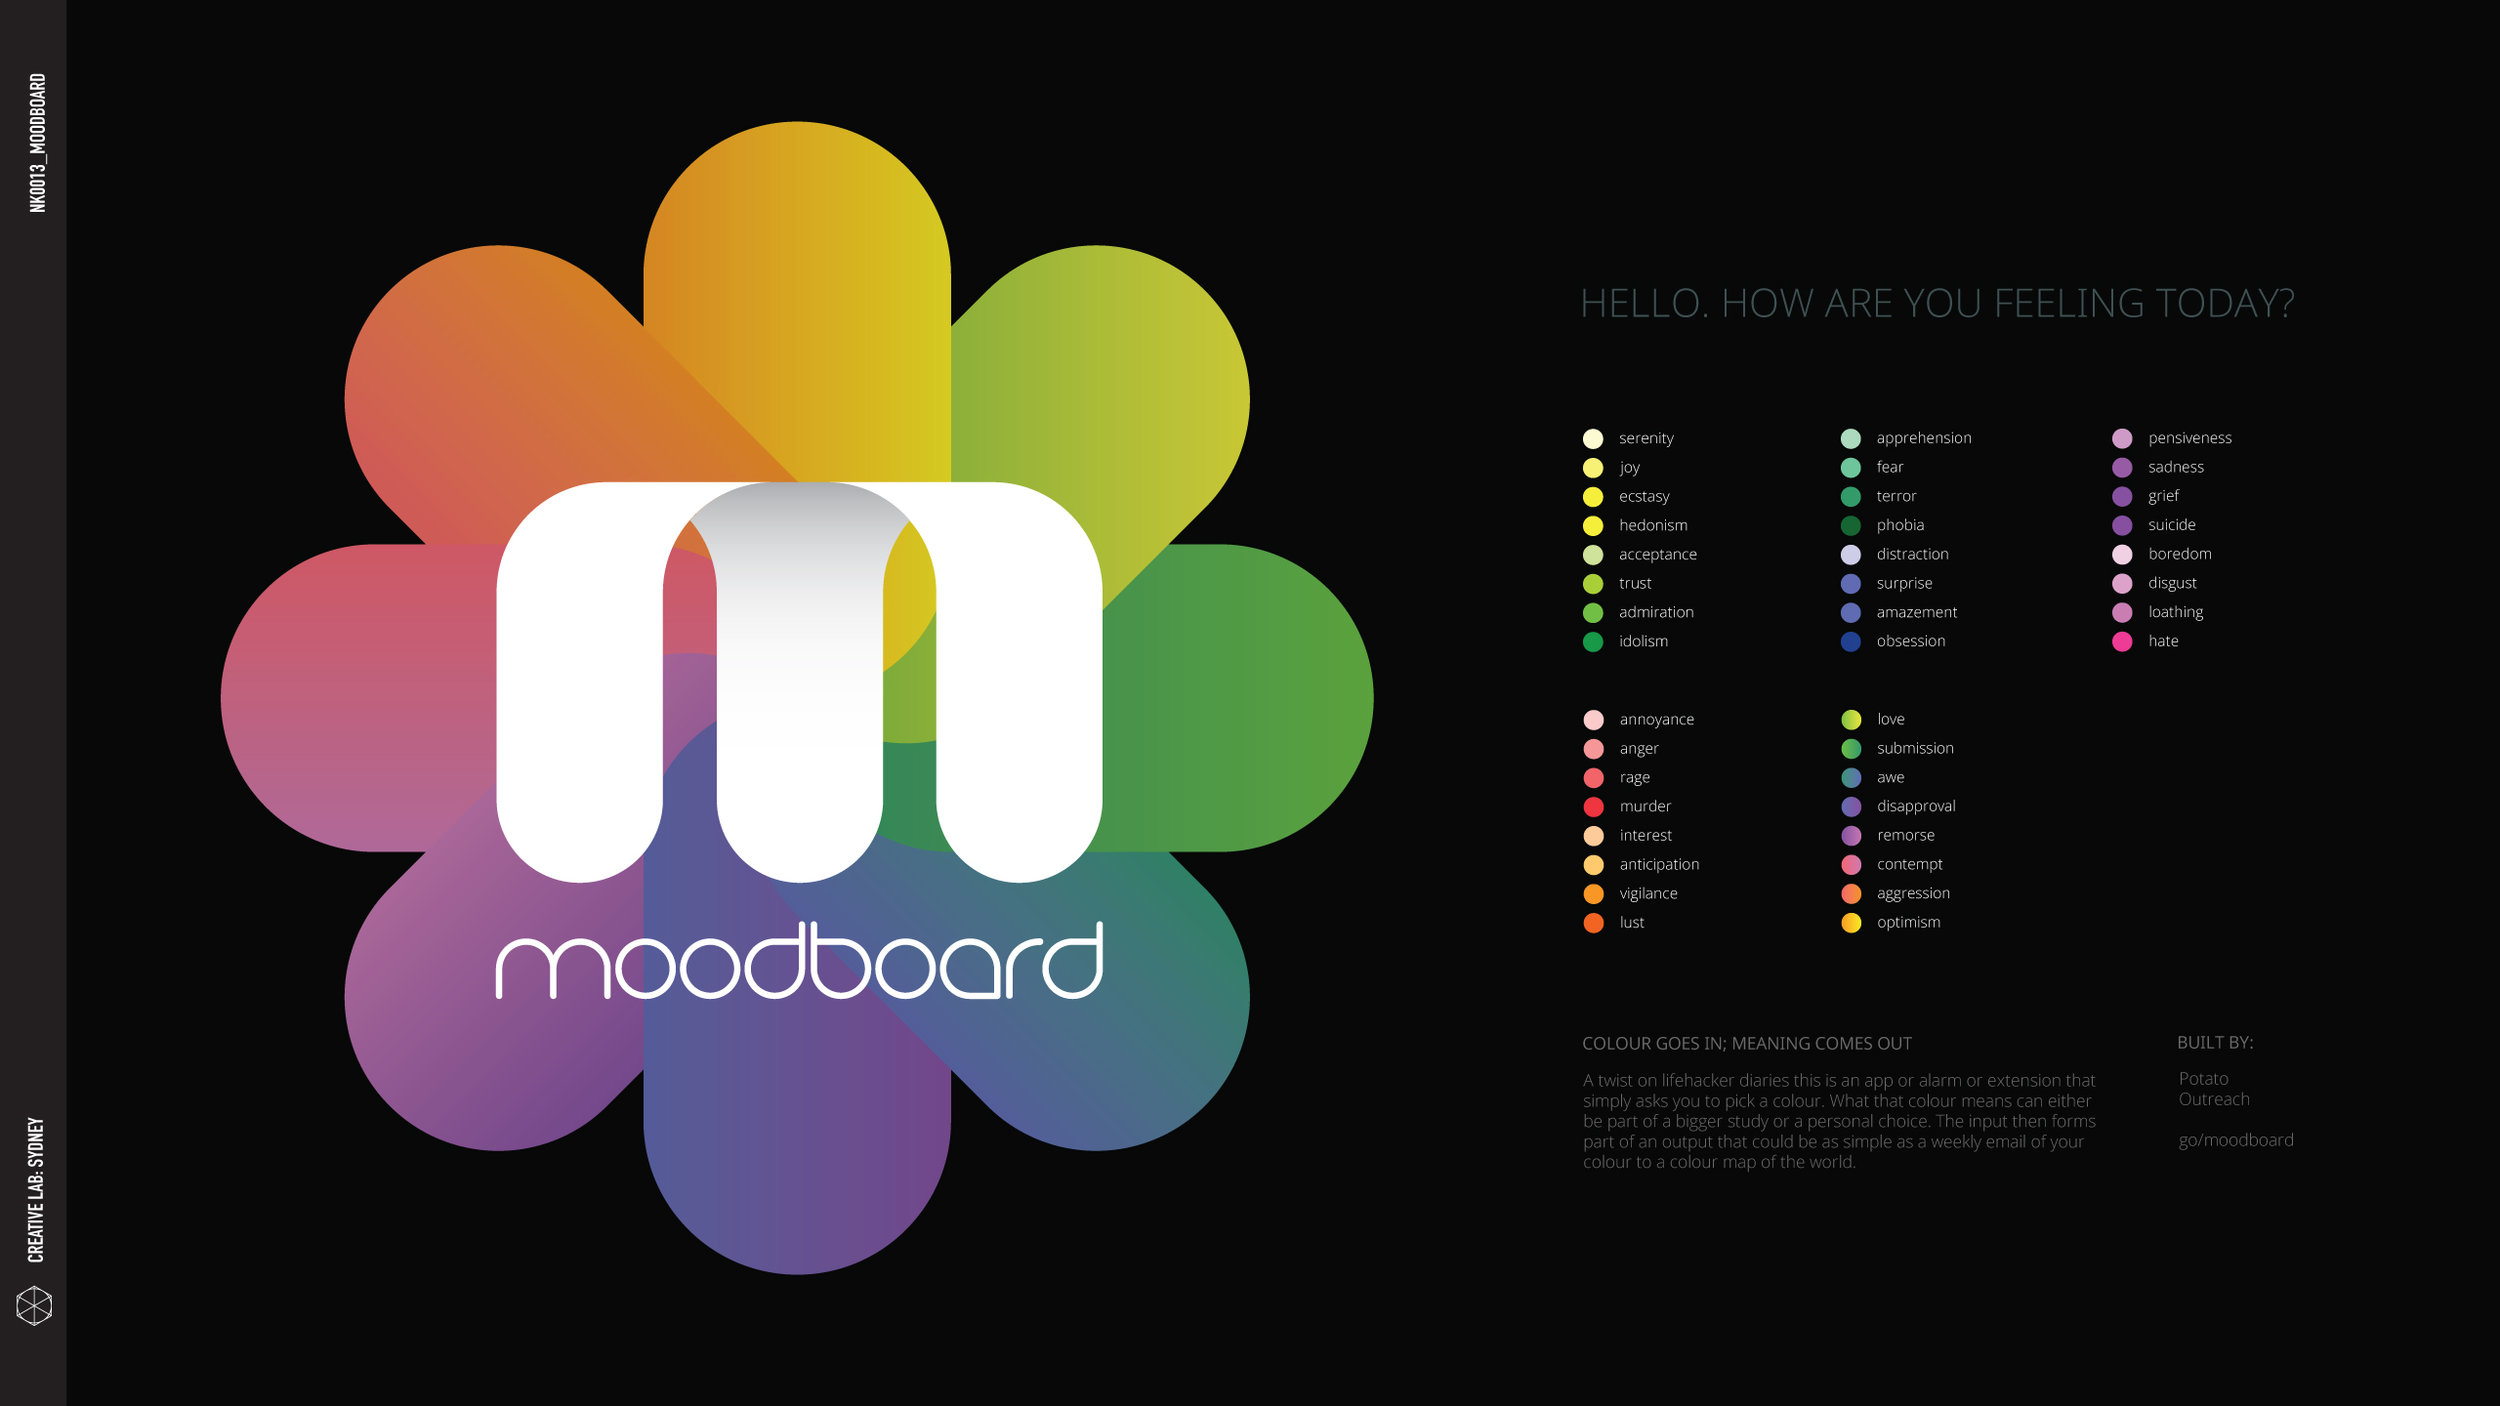 NK0013_Moodboard_Screen01.jpg